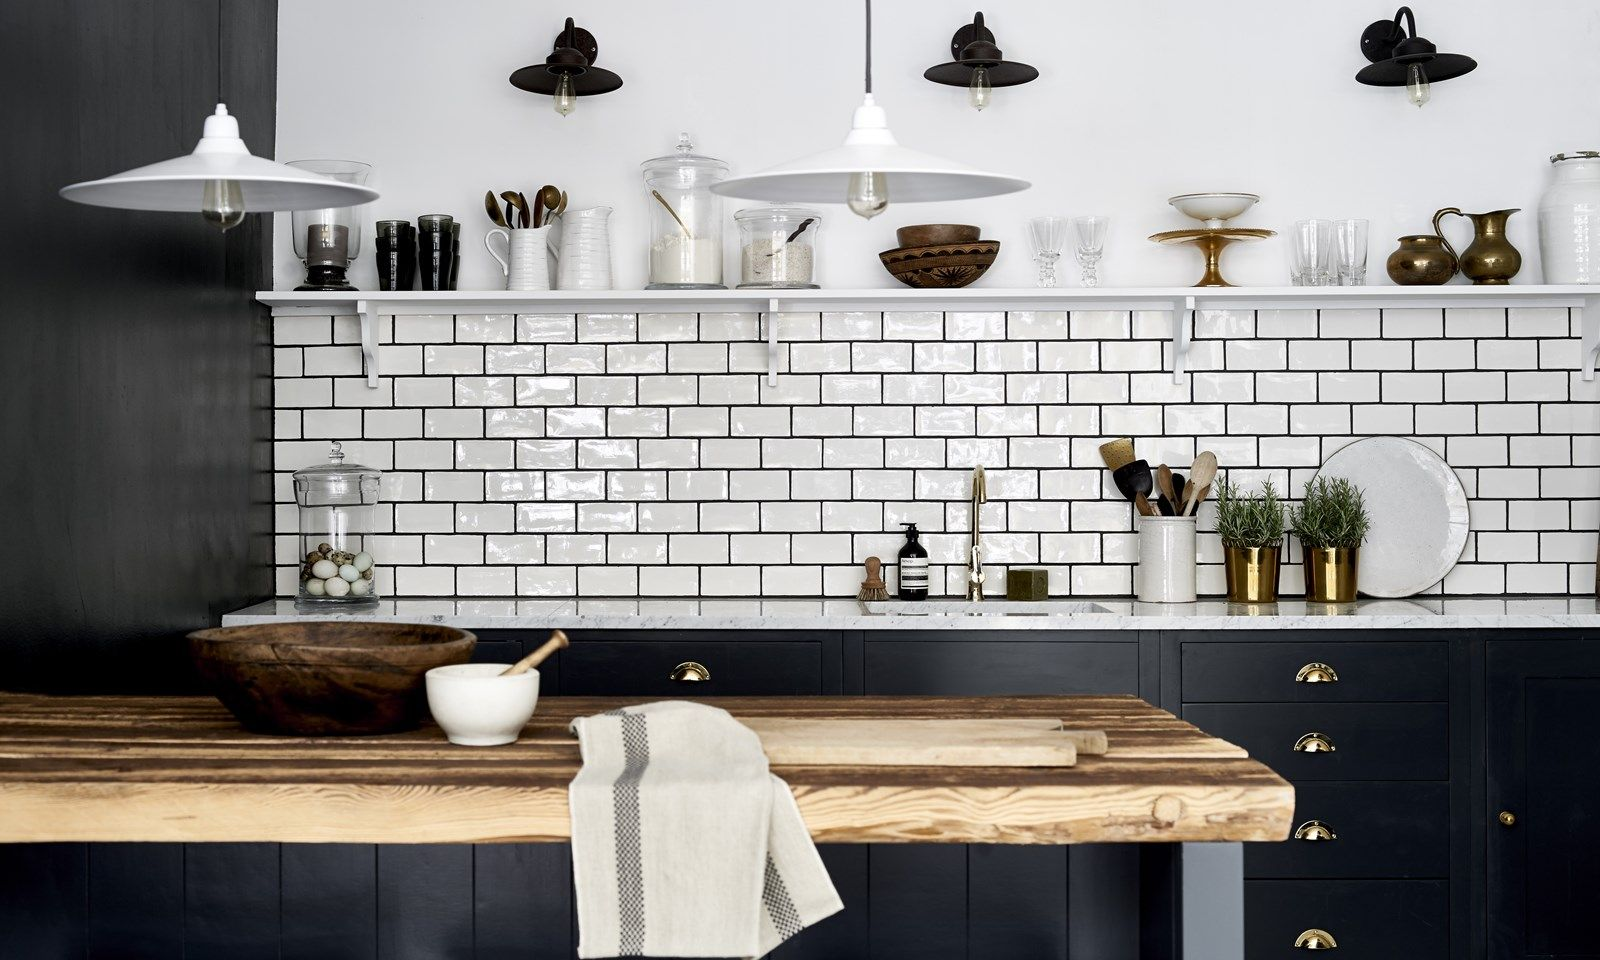 Suffolk kitchen neptune kitchen styling pinterest shaker